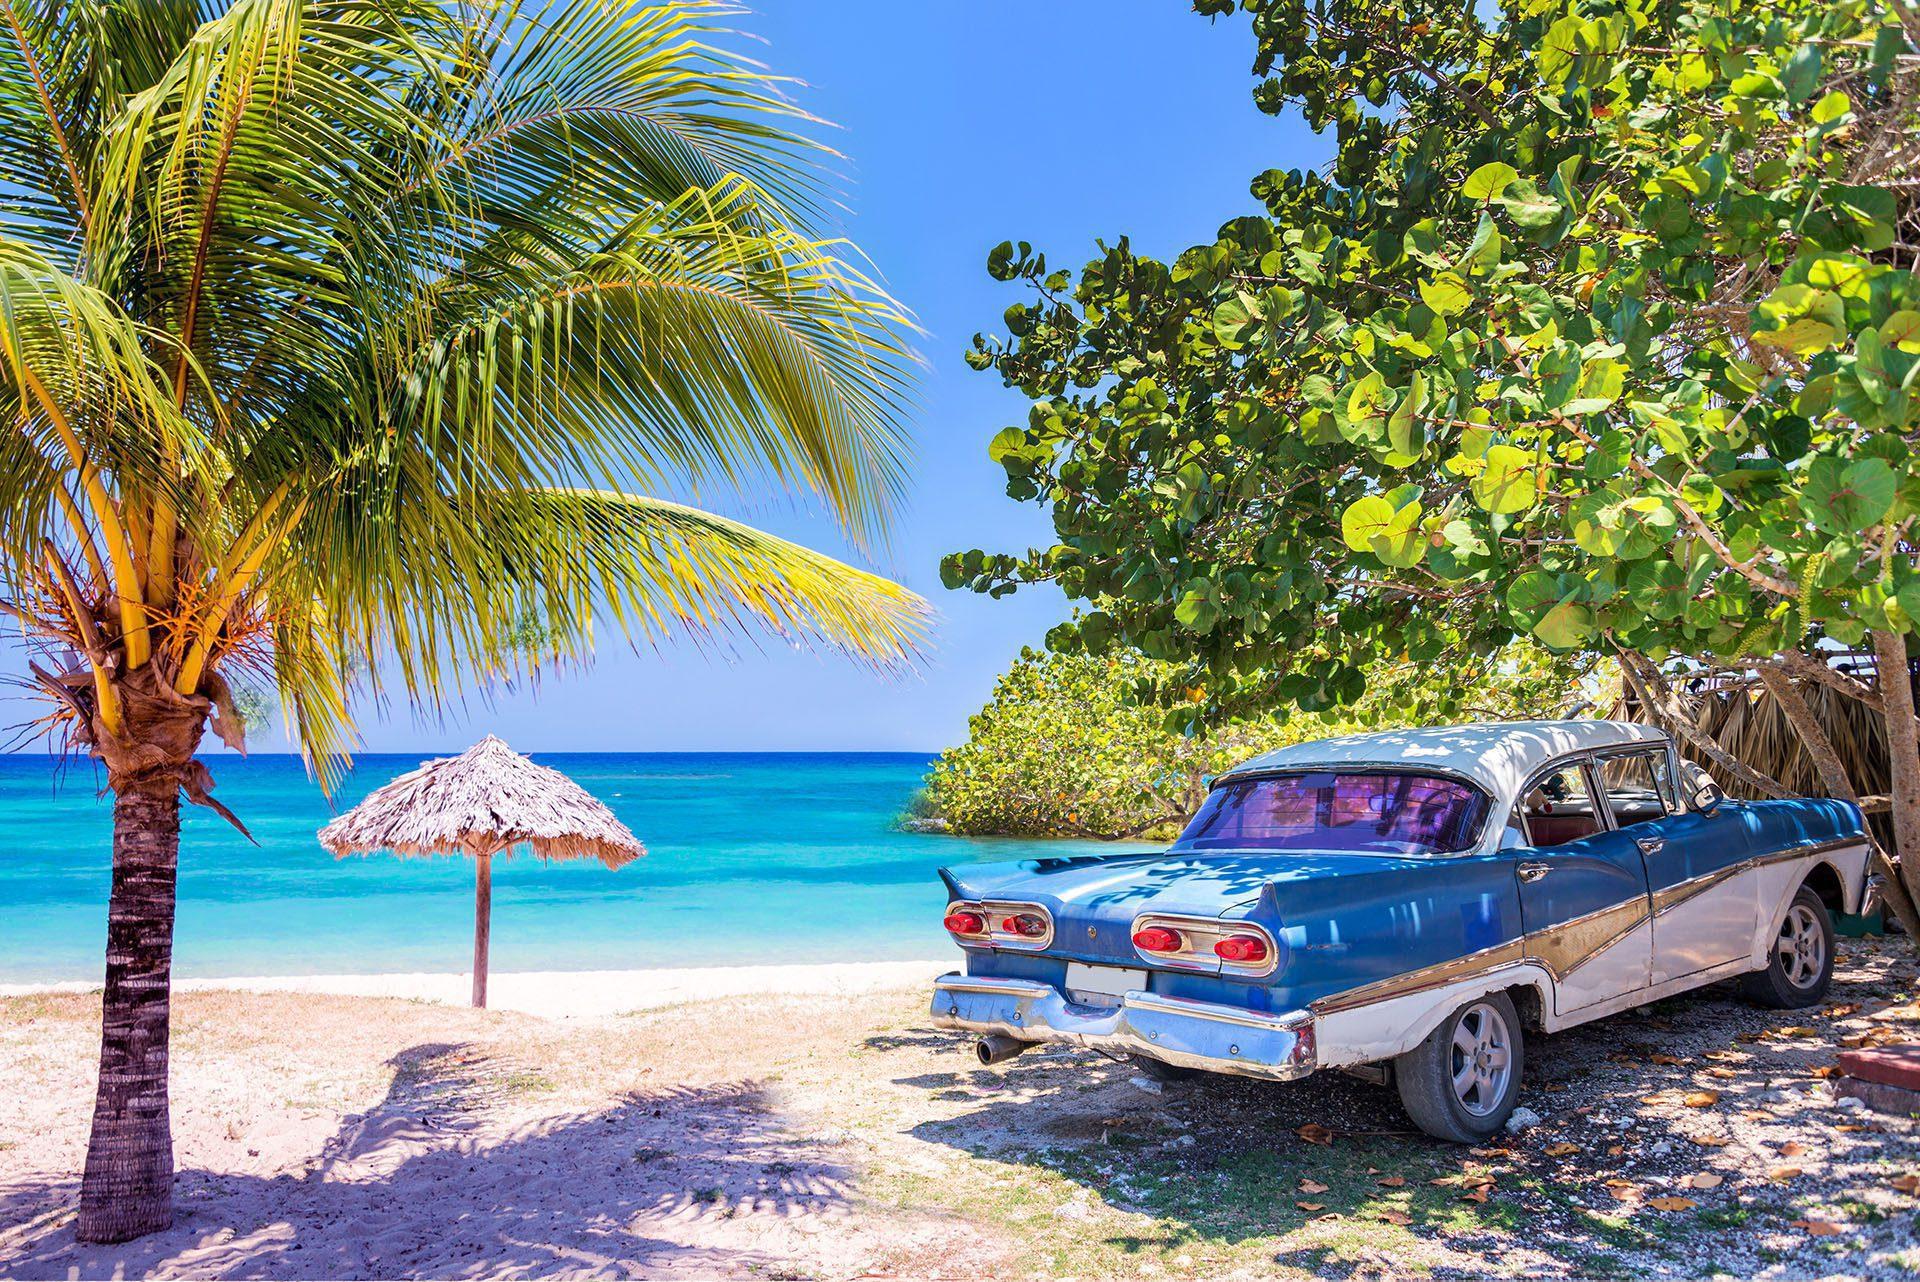 Les plus belles destinations vacances de Cuba